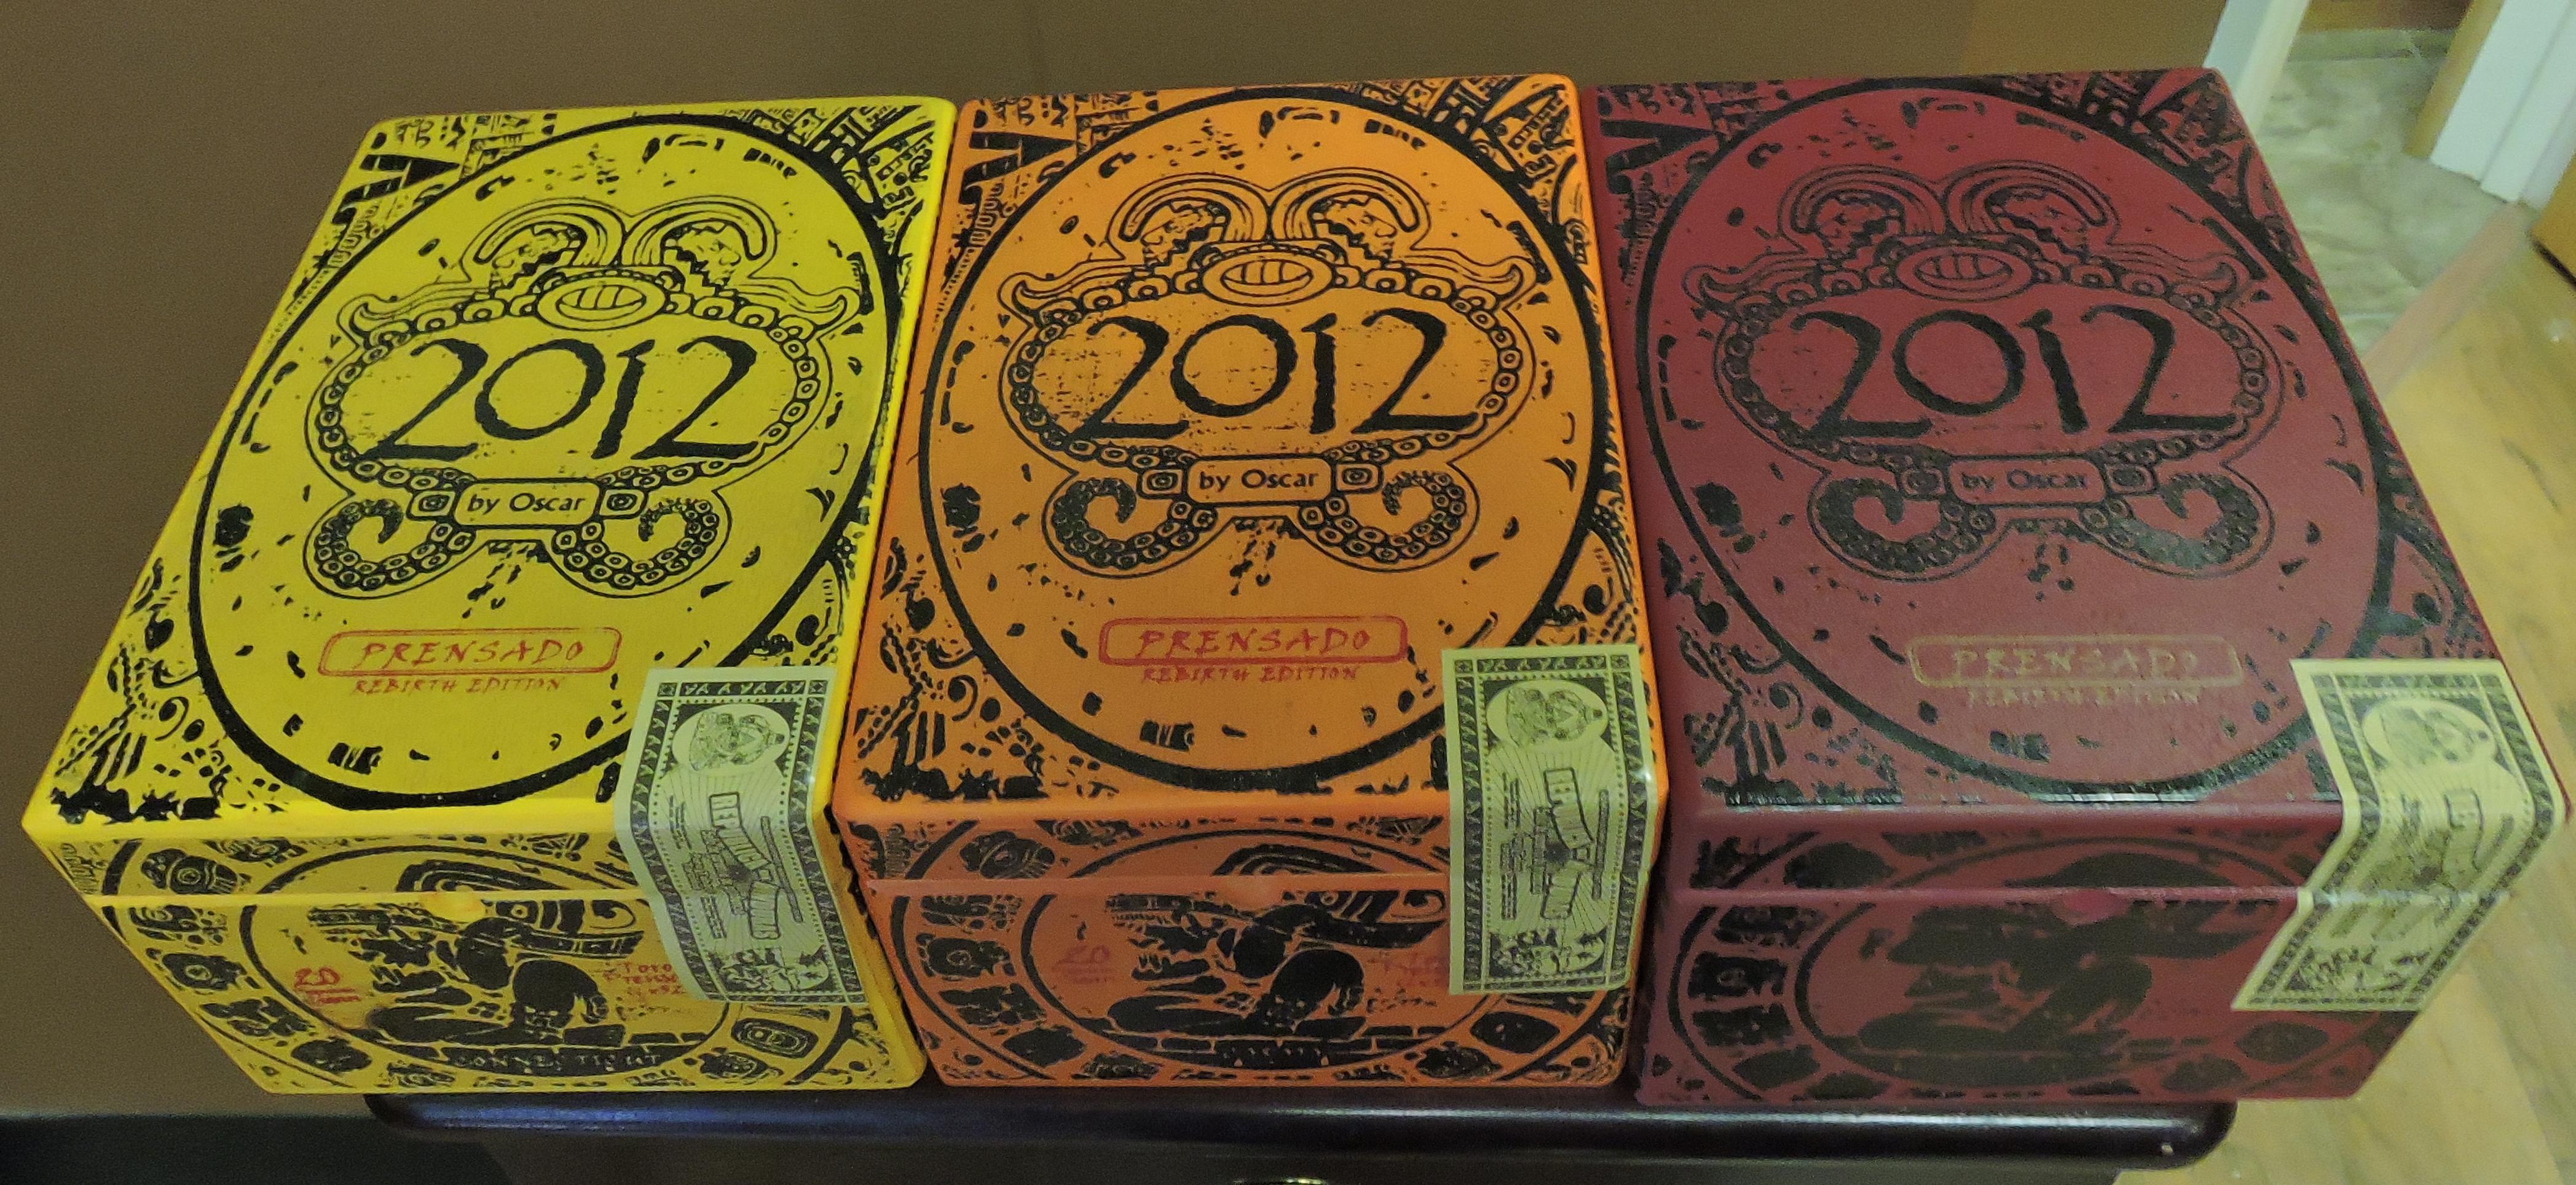 Cigar News: 2012 by Oscar Released by Oscar Valladares Tobacco & Co.